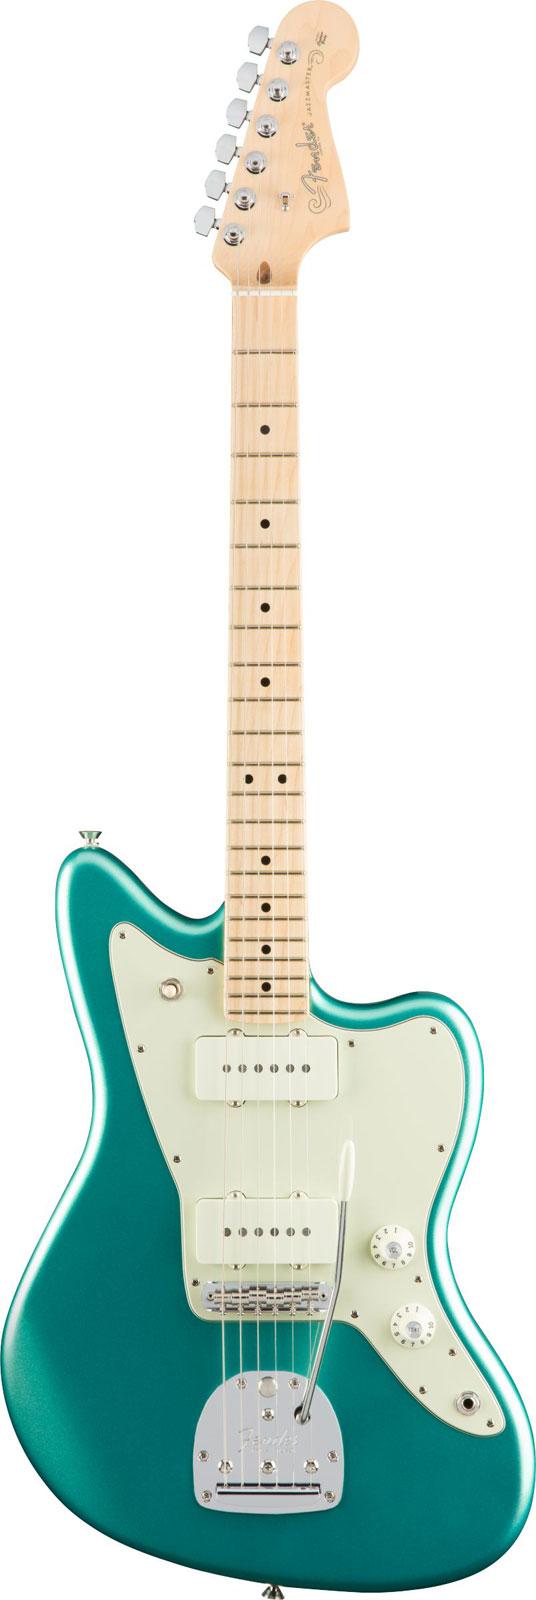 Fender American Professional Jazzmaster Mn Mystic Seafoam